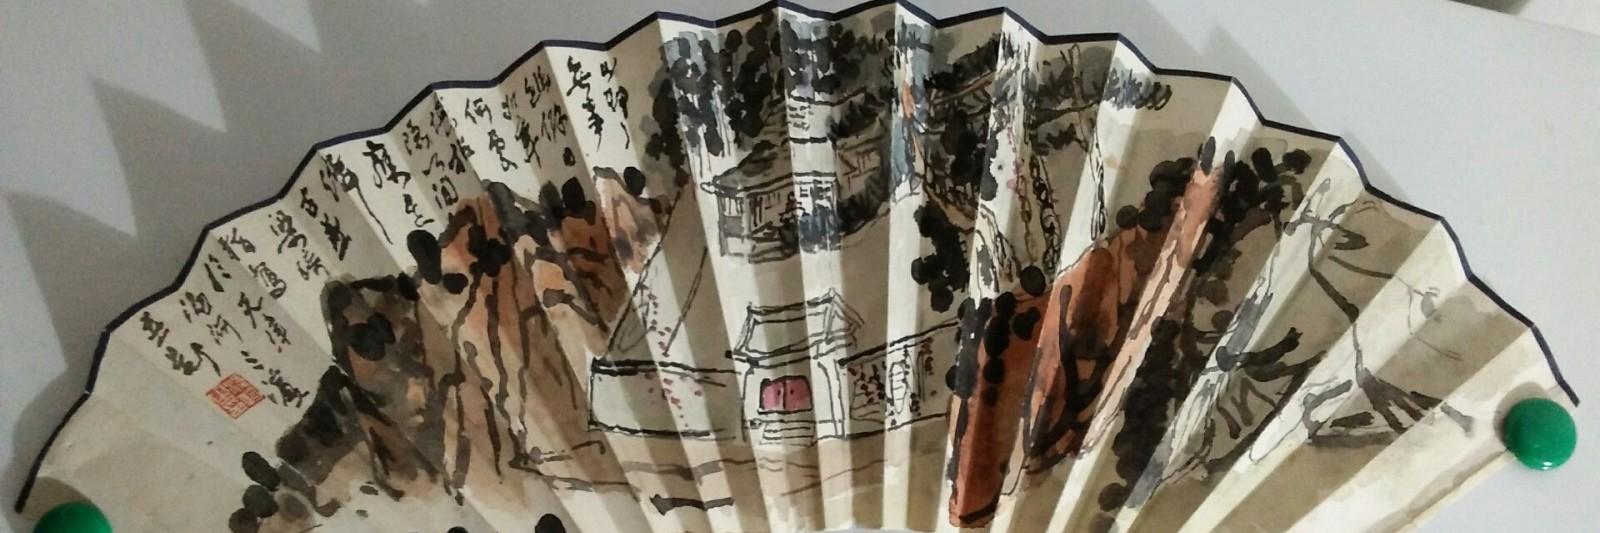 http://book.kongfz.com/230251/980658473/